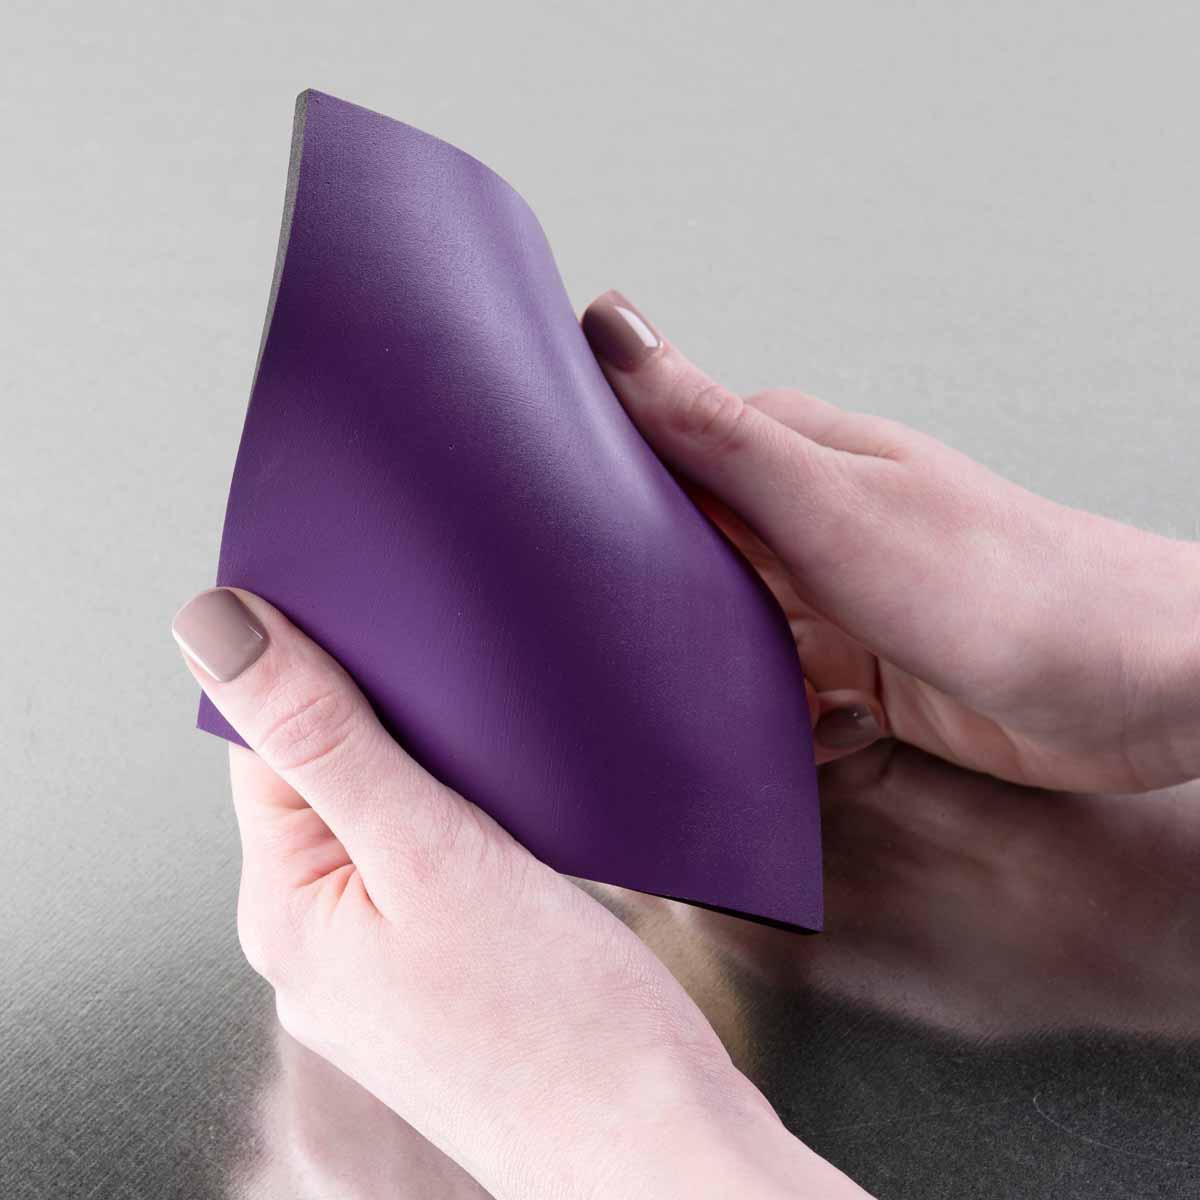 PlaidFX Smooth Satin Flexible Acrylic Paint - Amber Sand, 3 oz. - 36846